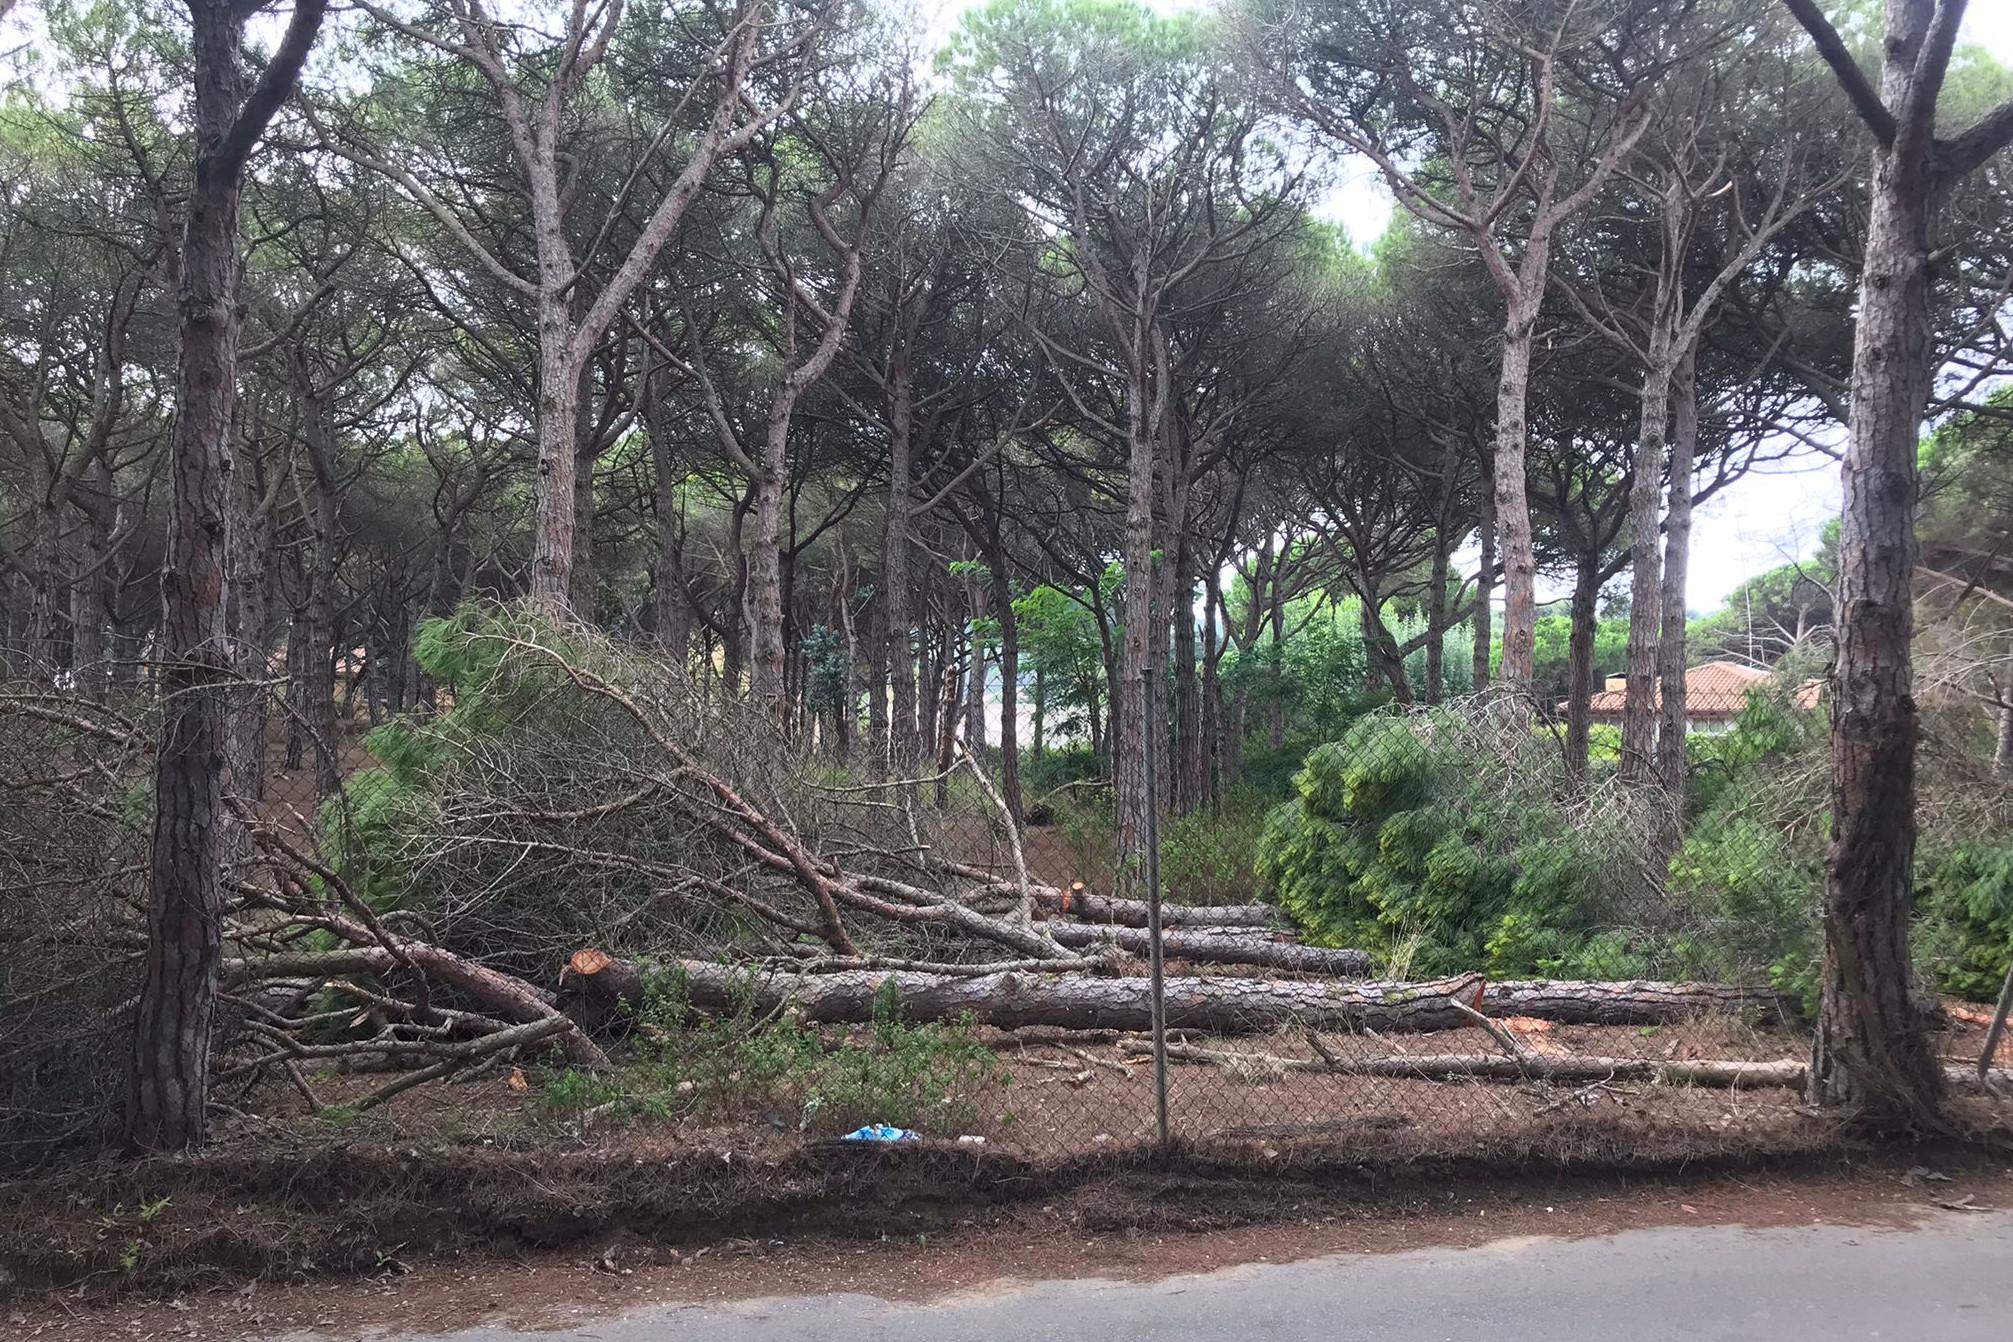 Tala d'arbres a la Pineda de la Fosca de Palamós | ACN